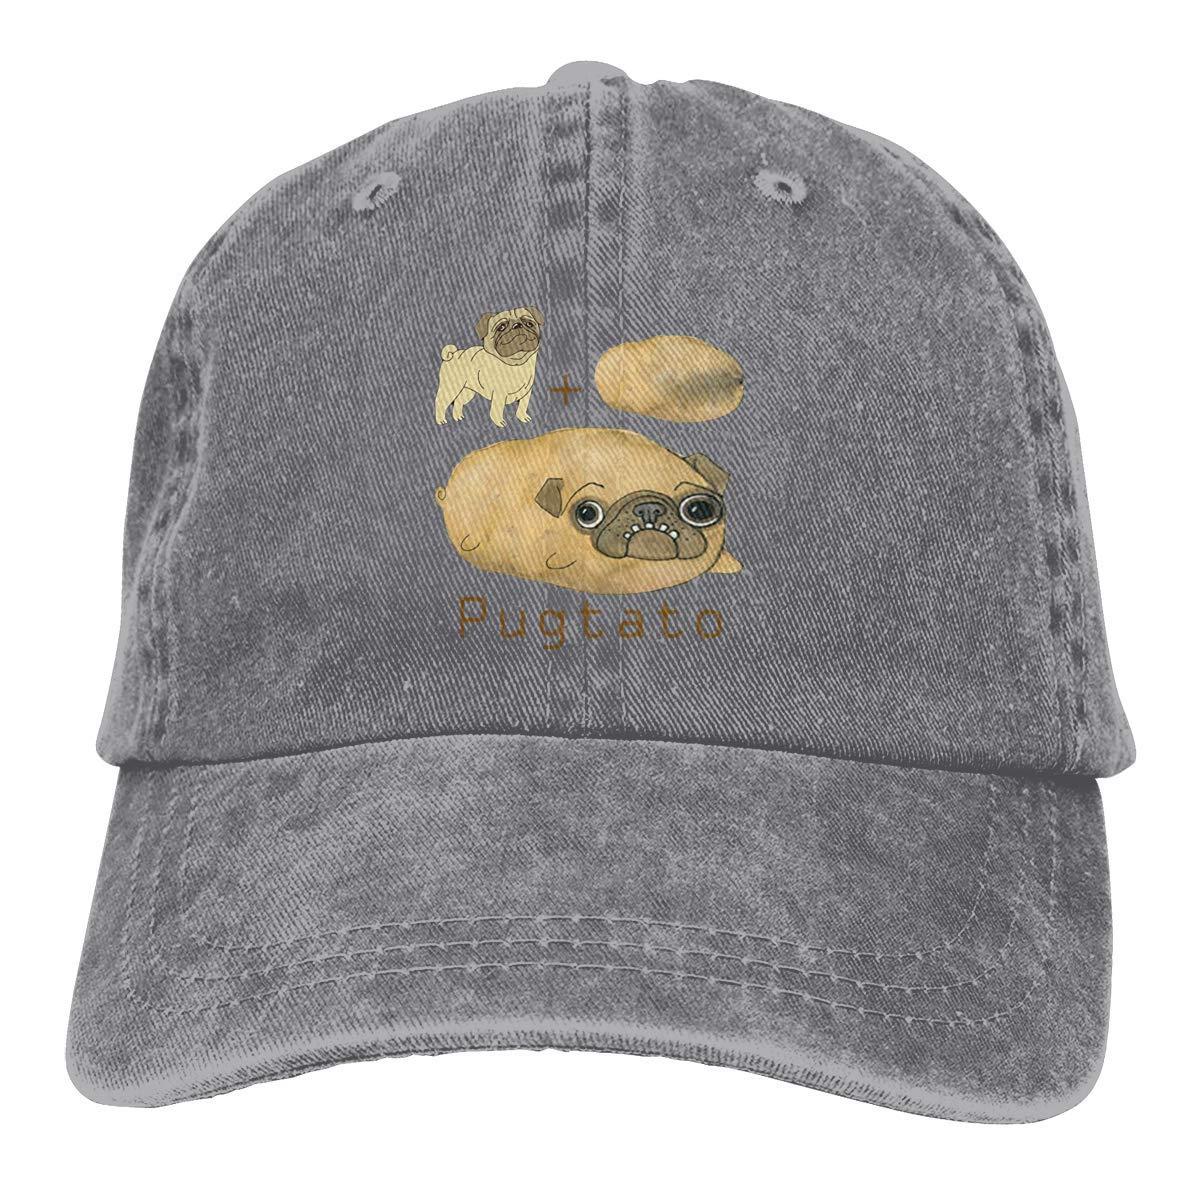 Qbeir Adult Unisex Cowboy Cap Adjustable Hat Pugtato Cotton Denim